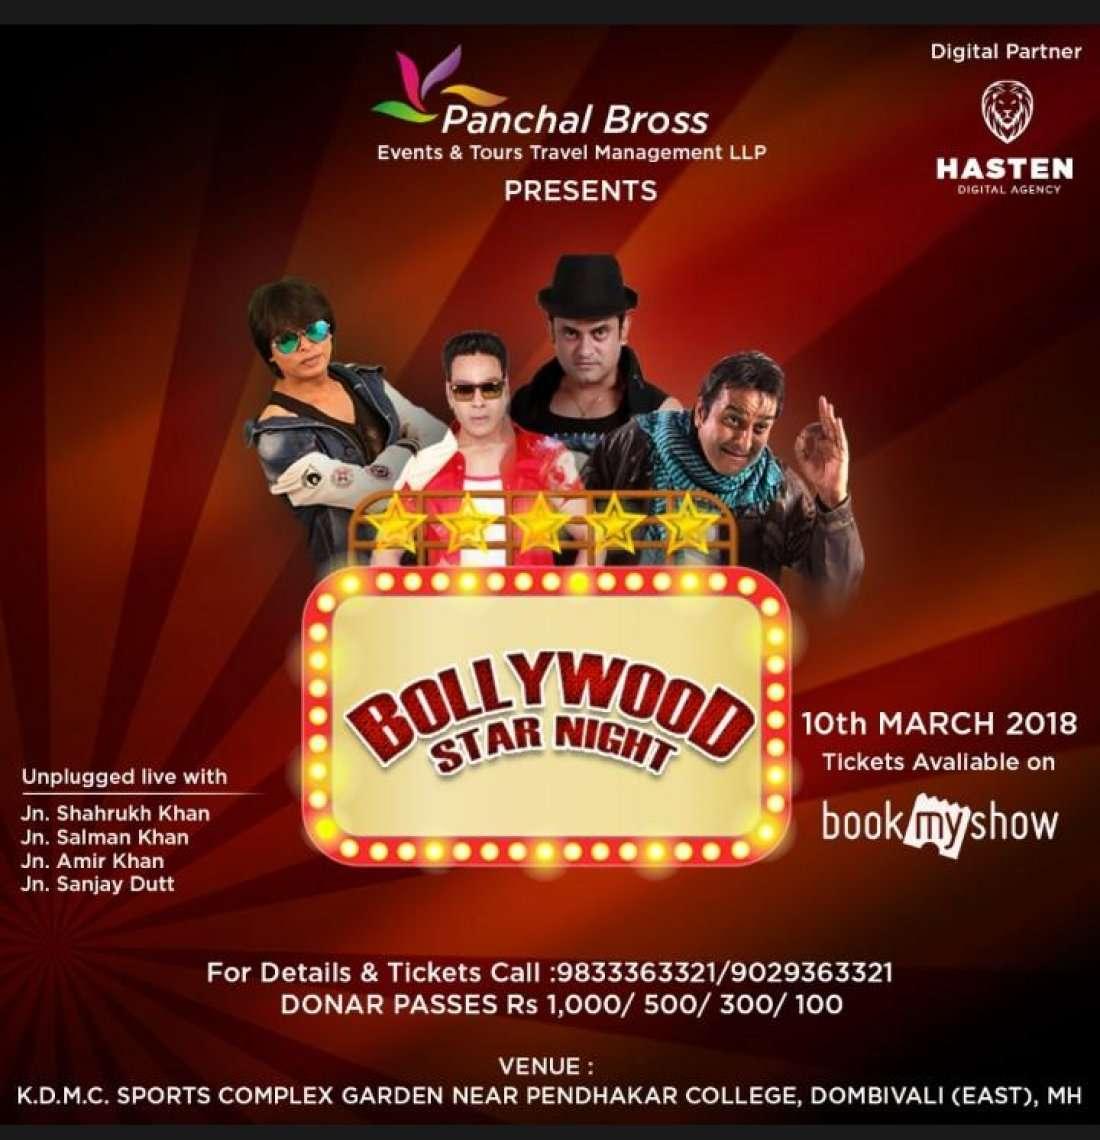 Bollywood Stars Night